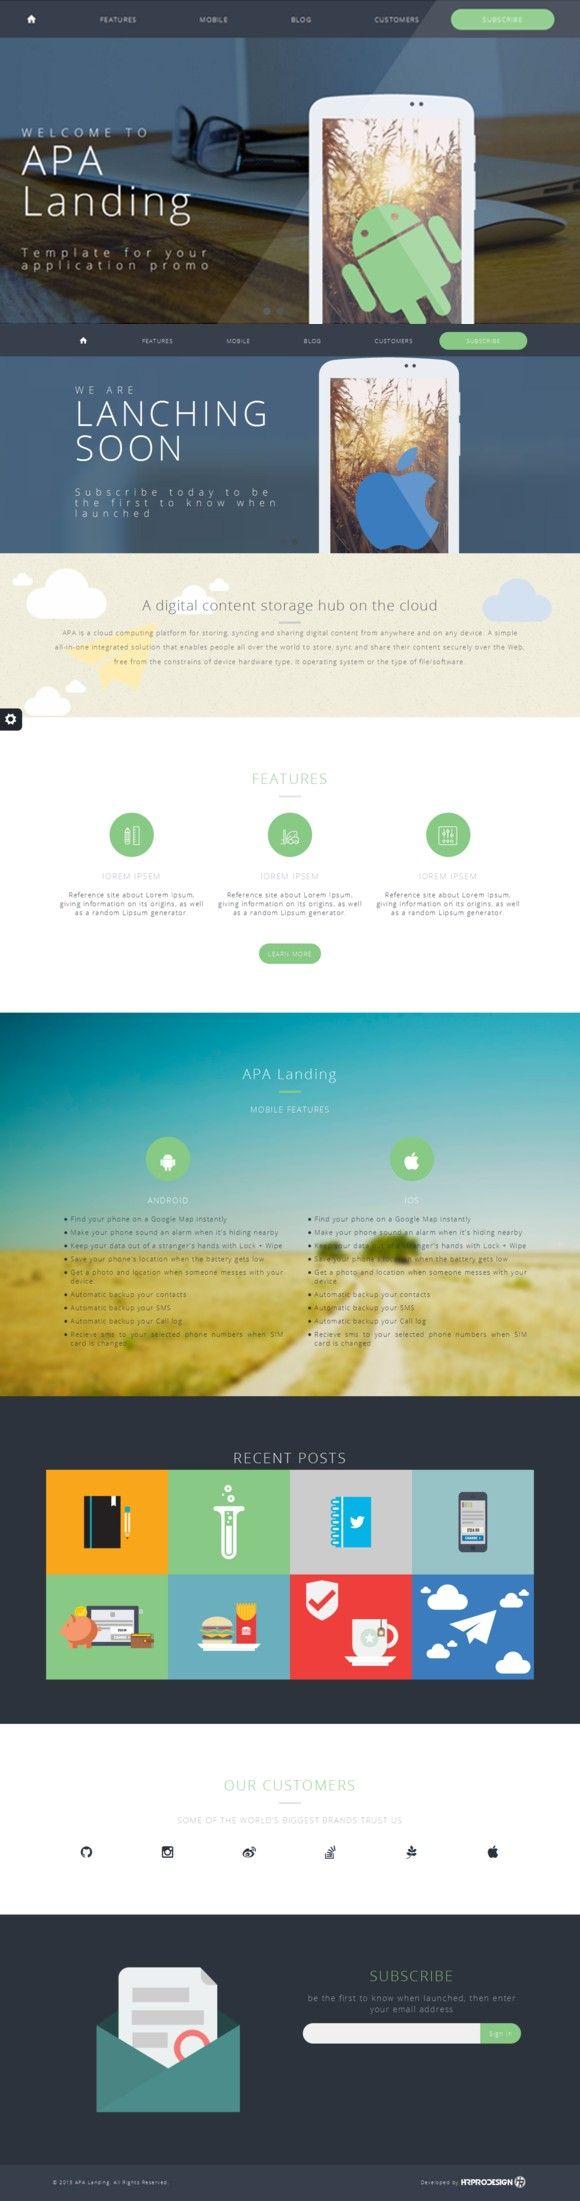 best ideas about apa template apa format apa landing html css themes 12 00